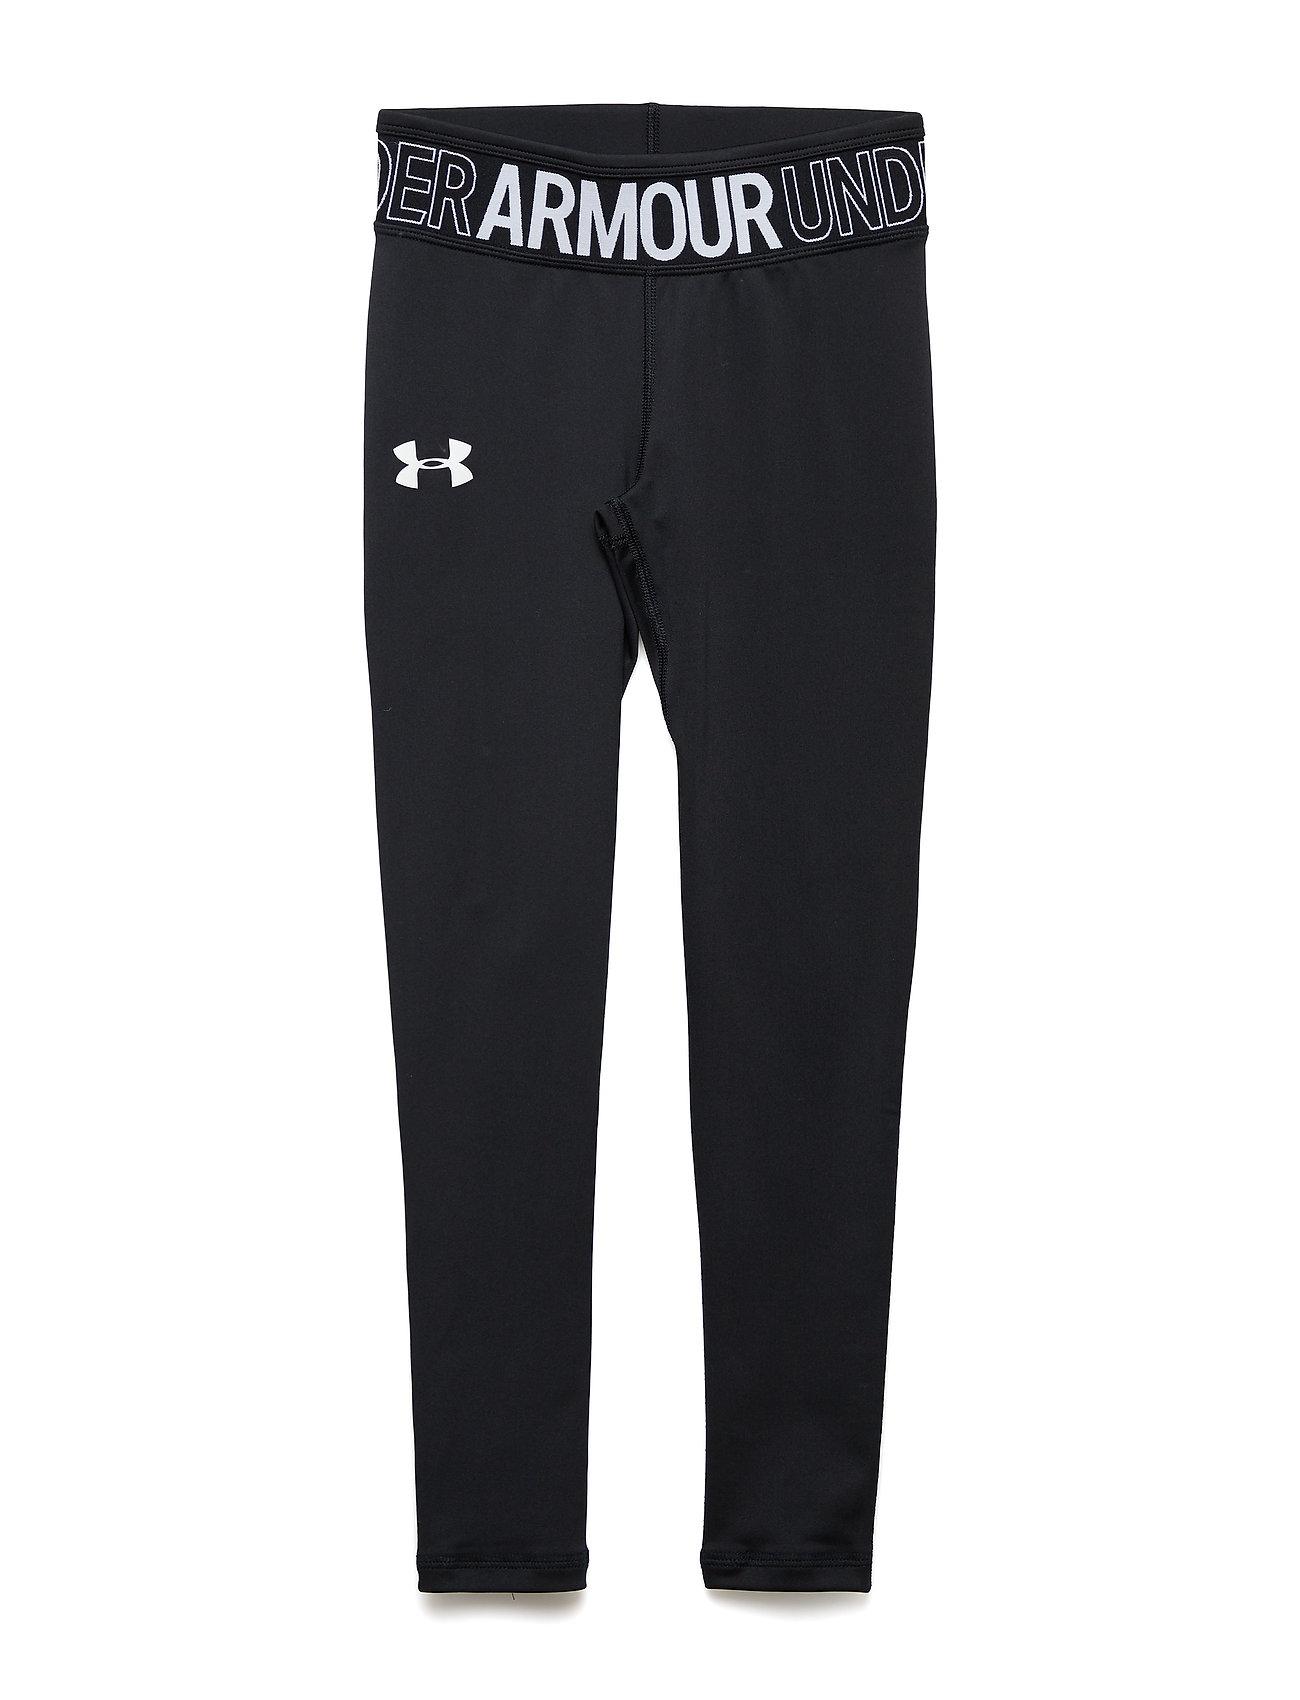 Image of Armour Hg Legging (3080429609)